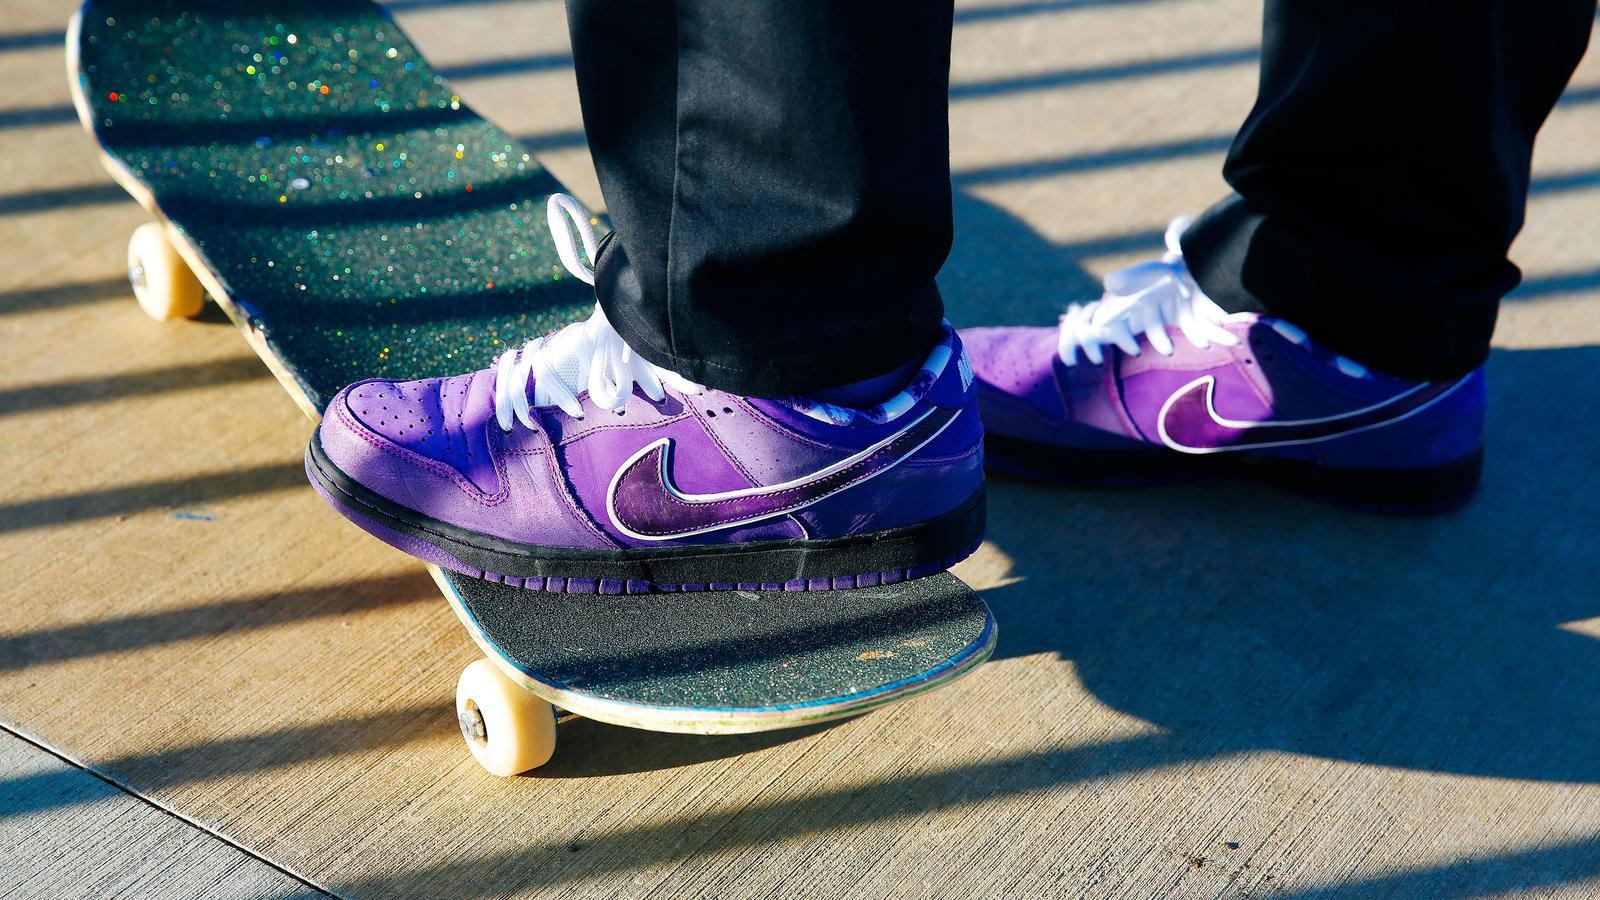 Miseria Oficiales Enfriarse  Air Jordan 1: The SB Dunk Killer - Sneaker History